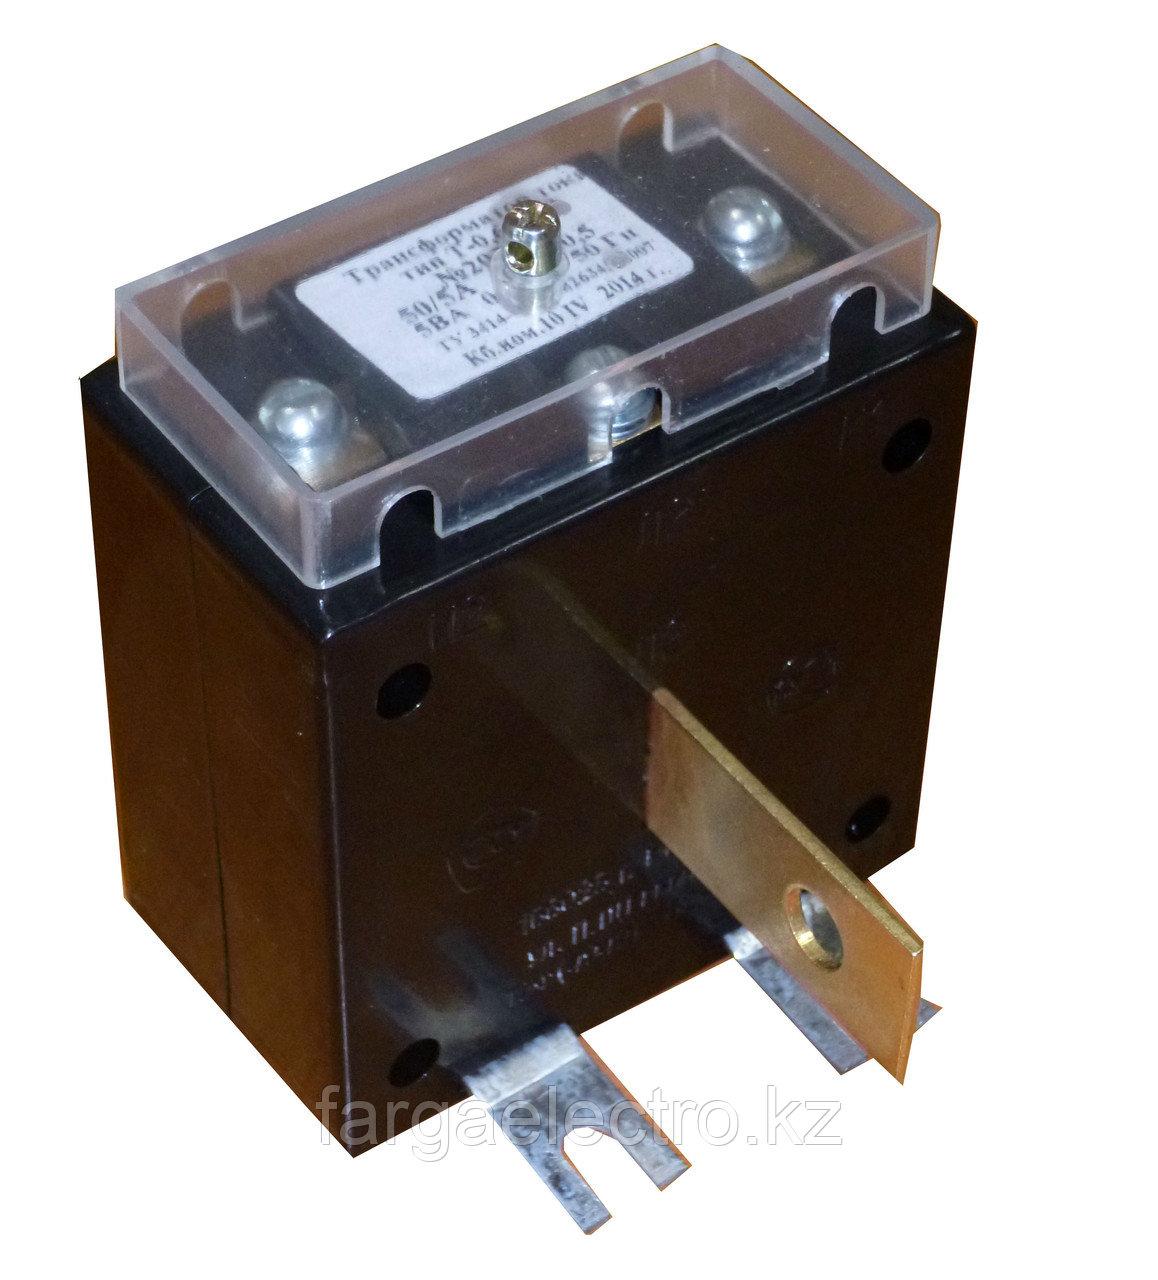 Трансформатор тока Т-0,66 150/5